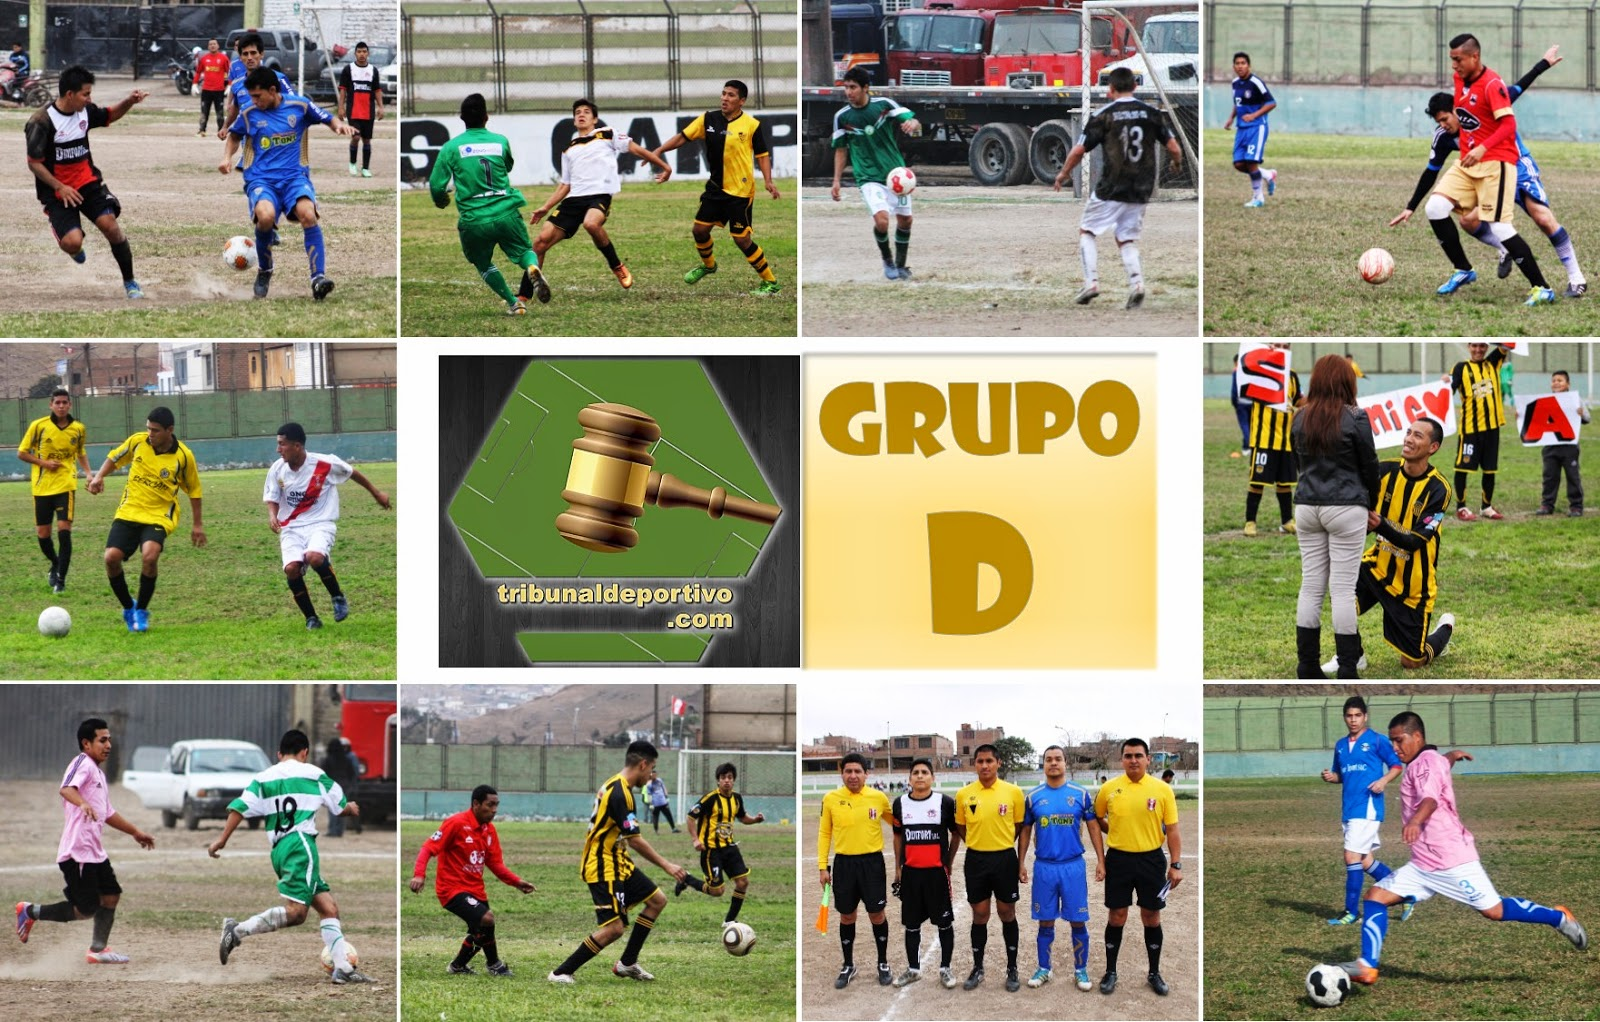 http://tribunal-deportivo.blogspot.com/2014/09/departamental-callao-grupo-d-fecha-1.html